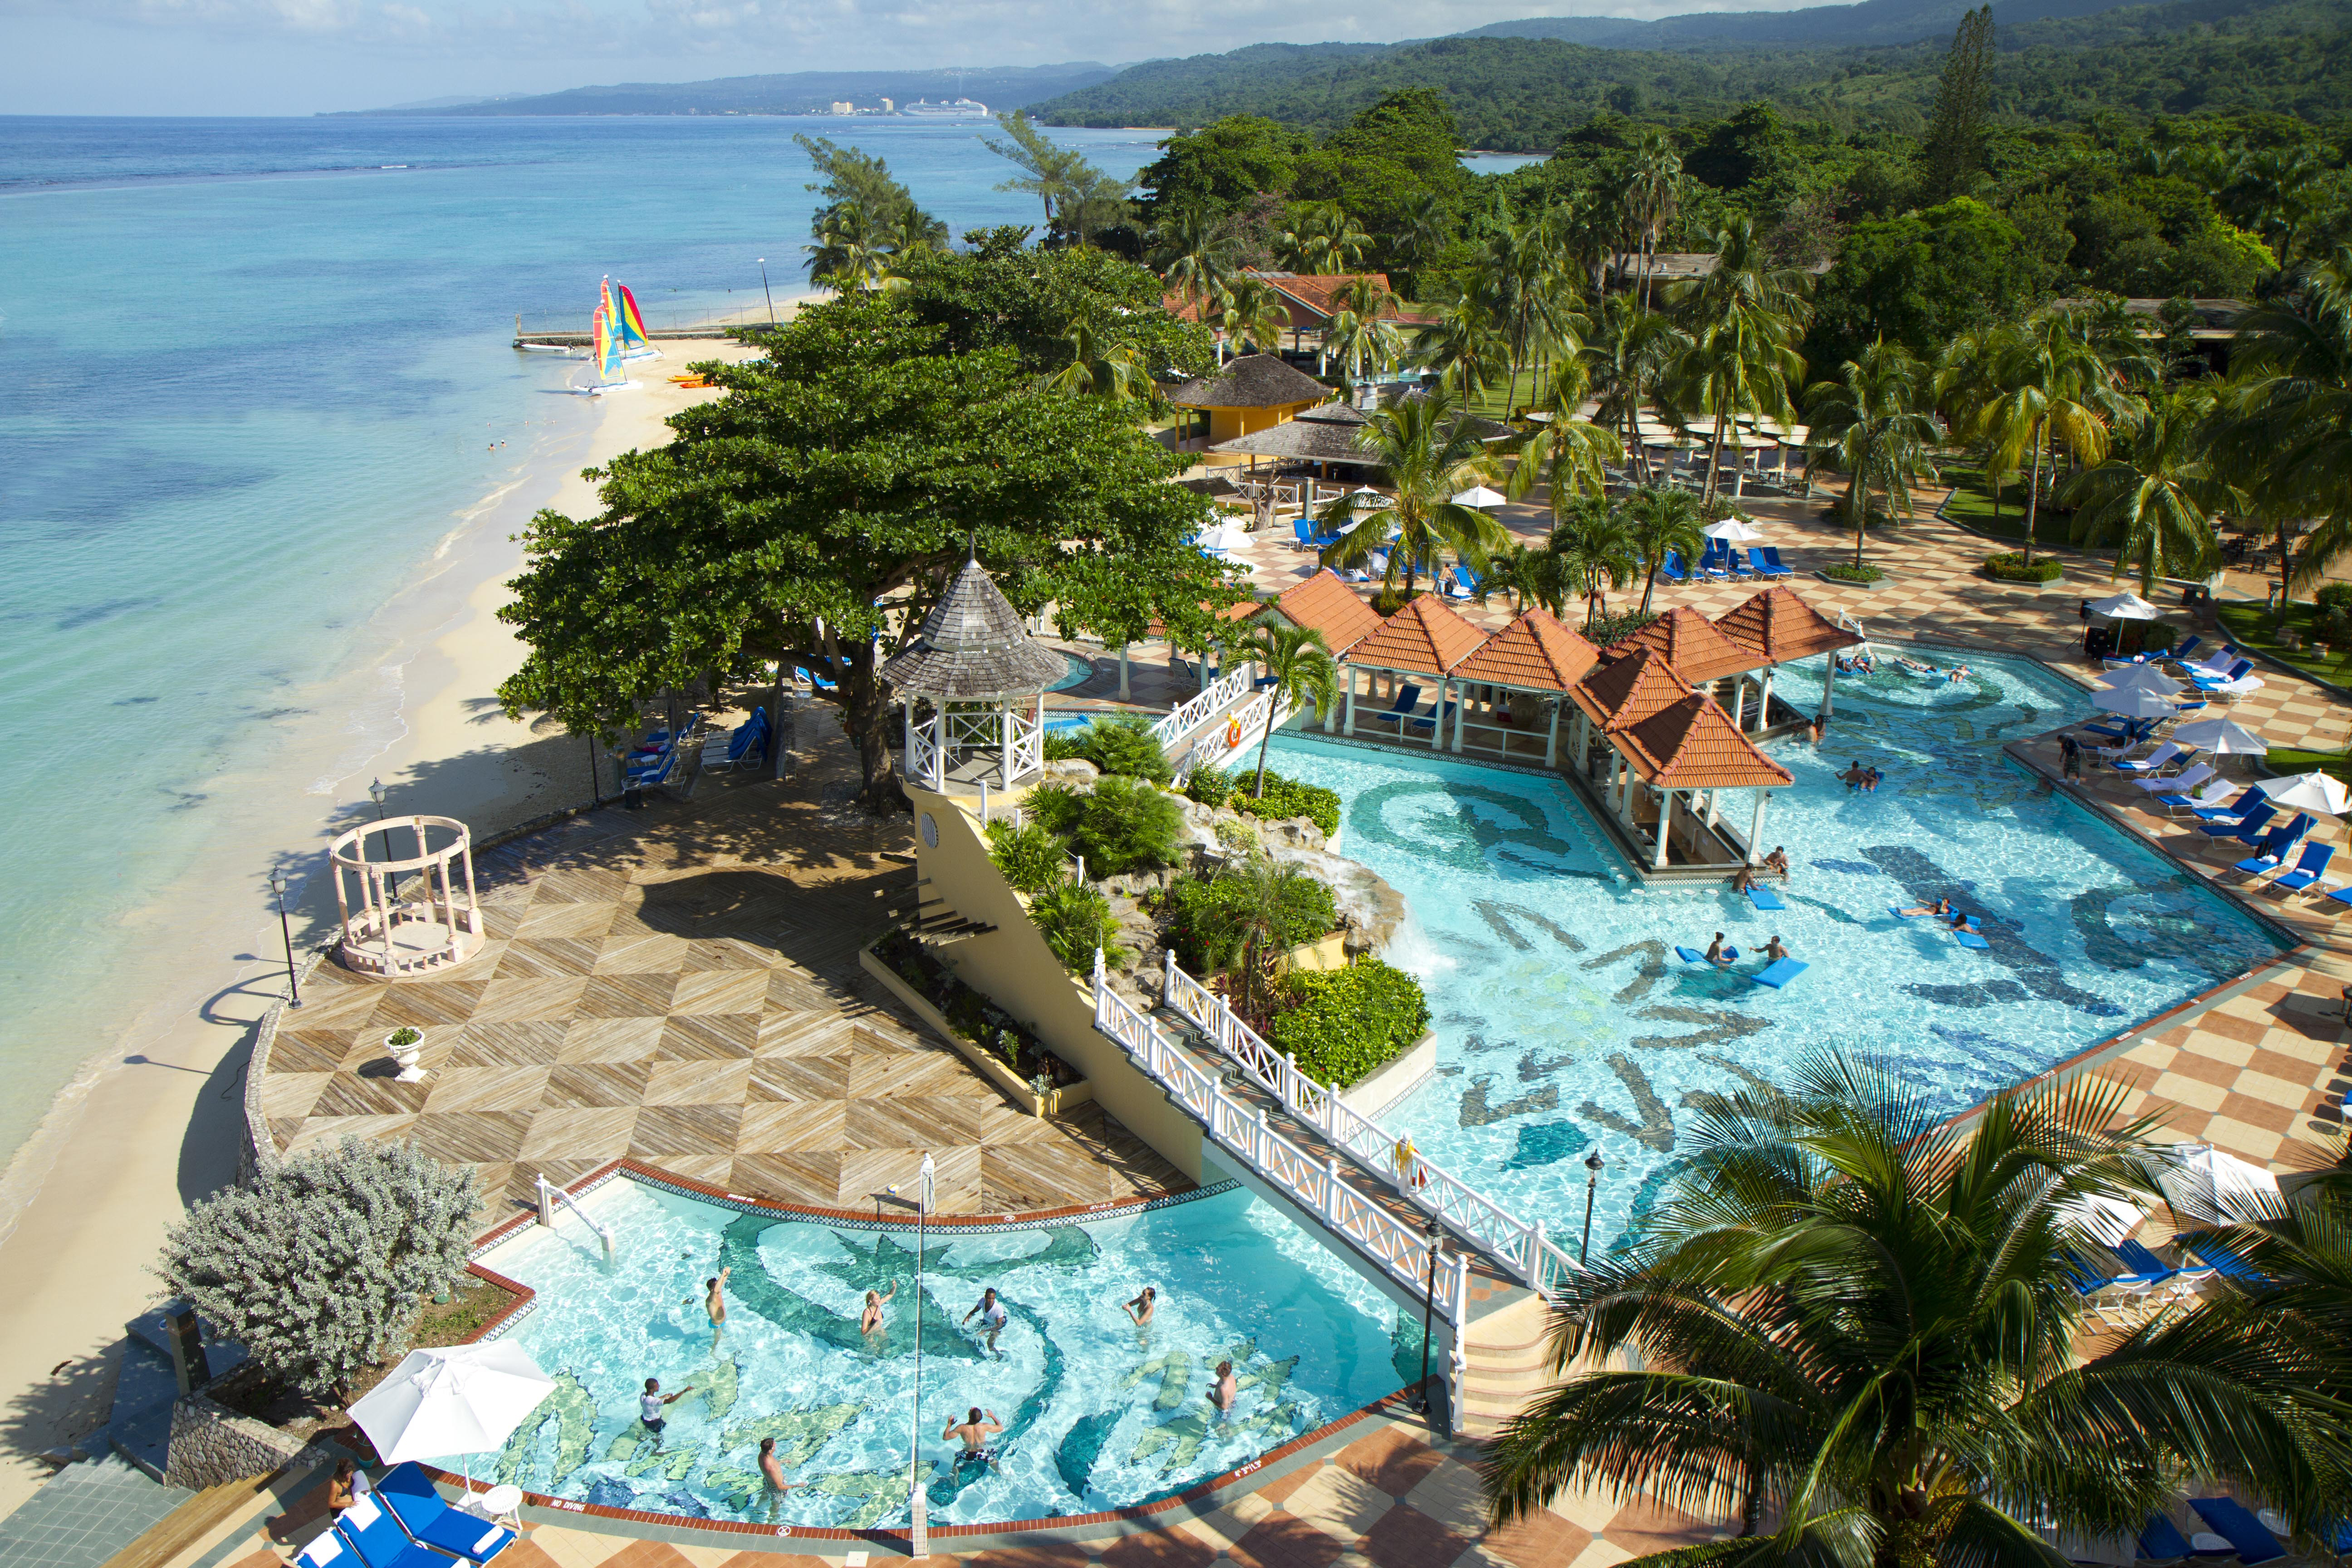 Hilton Debuts Second Jamaica Hotel